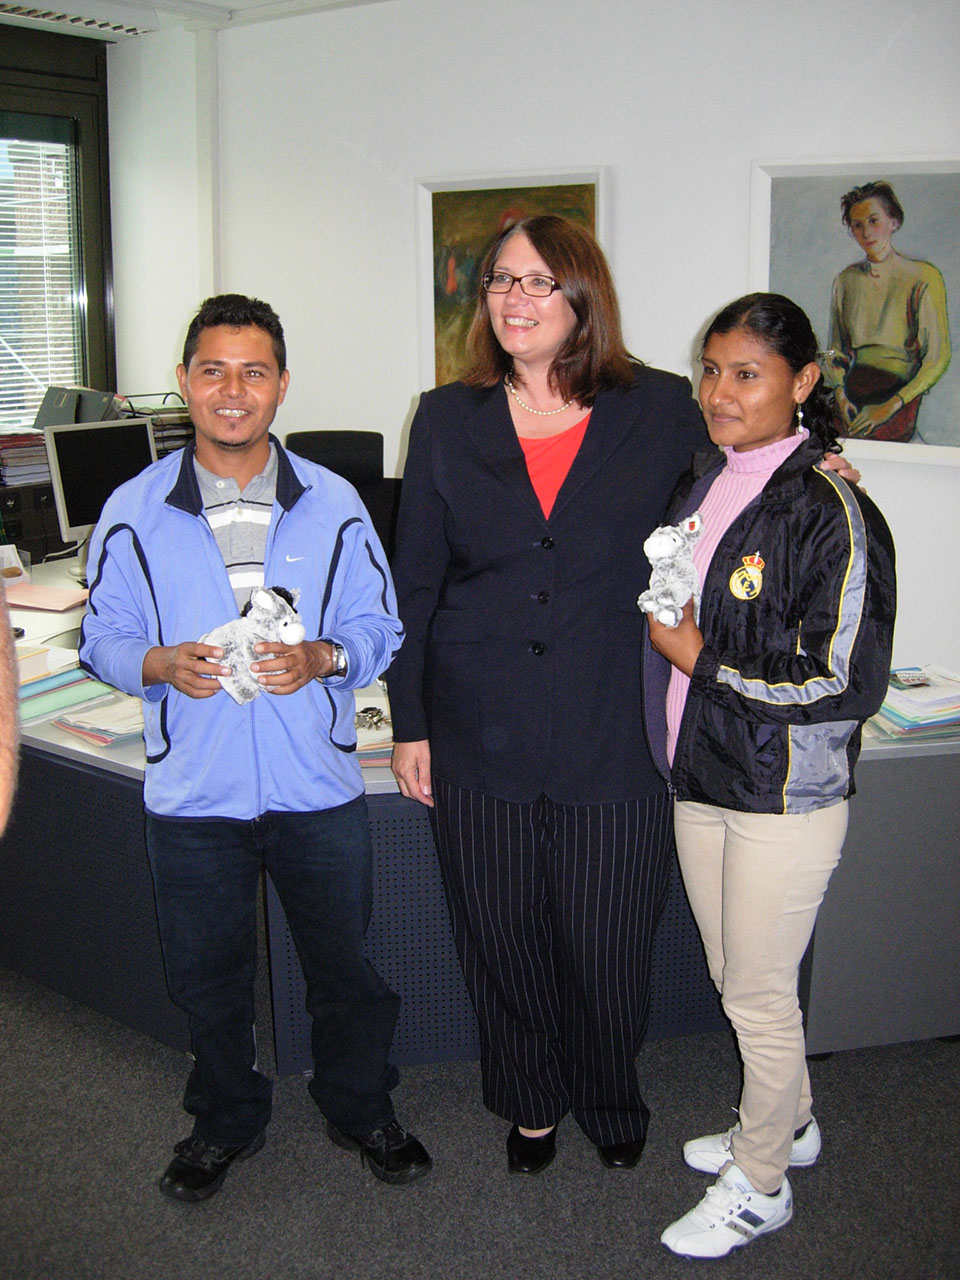 Maria und Cristino ausEl Salvador in Wesel angekommen